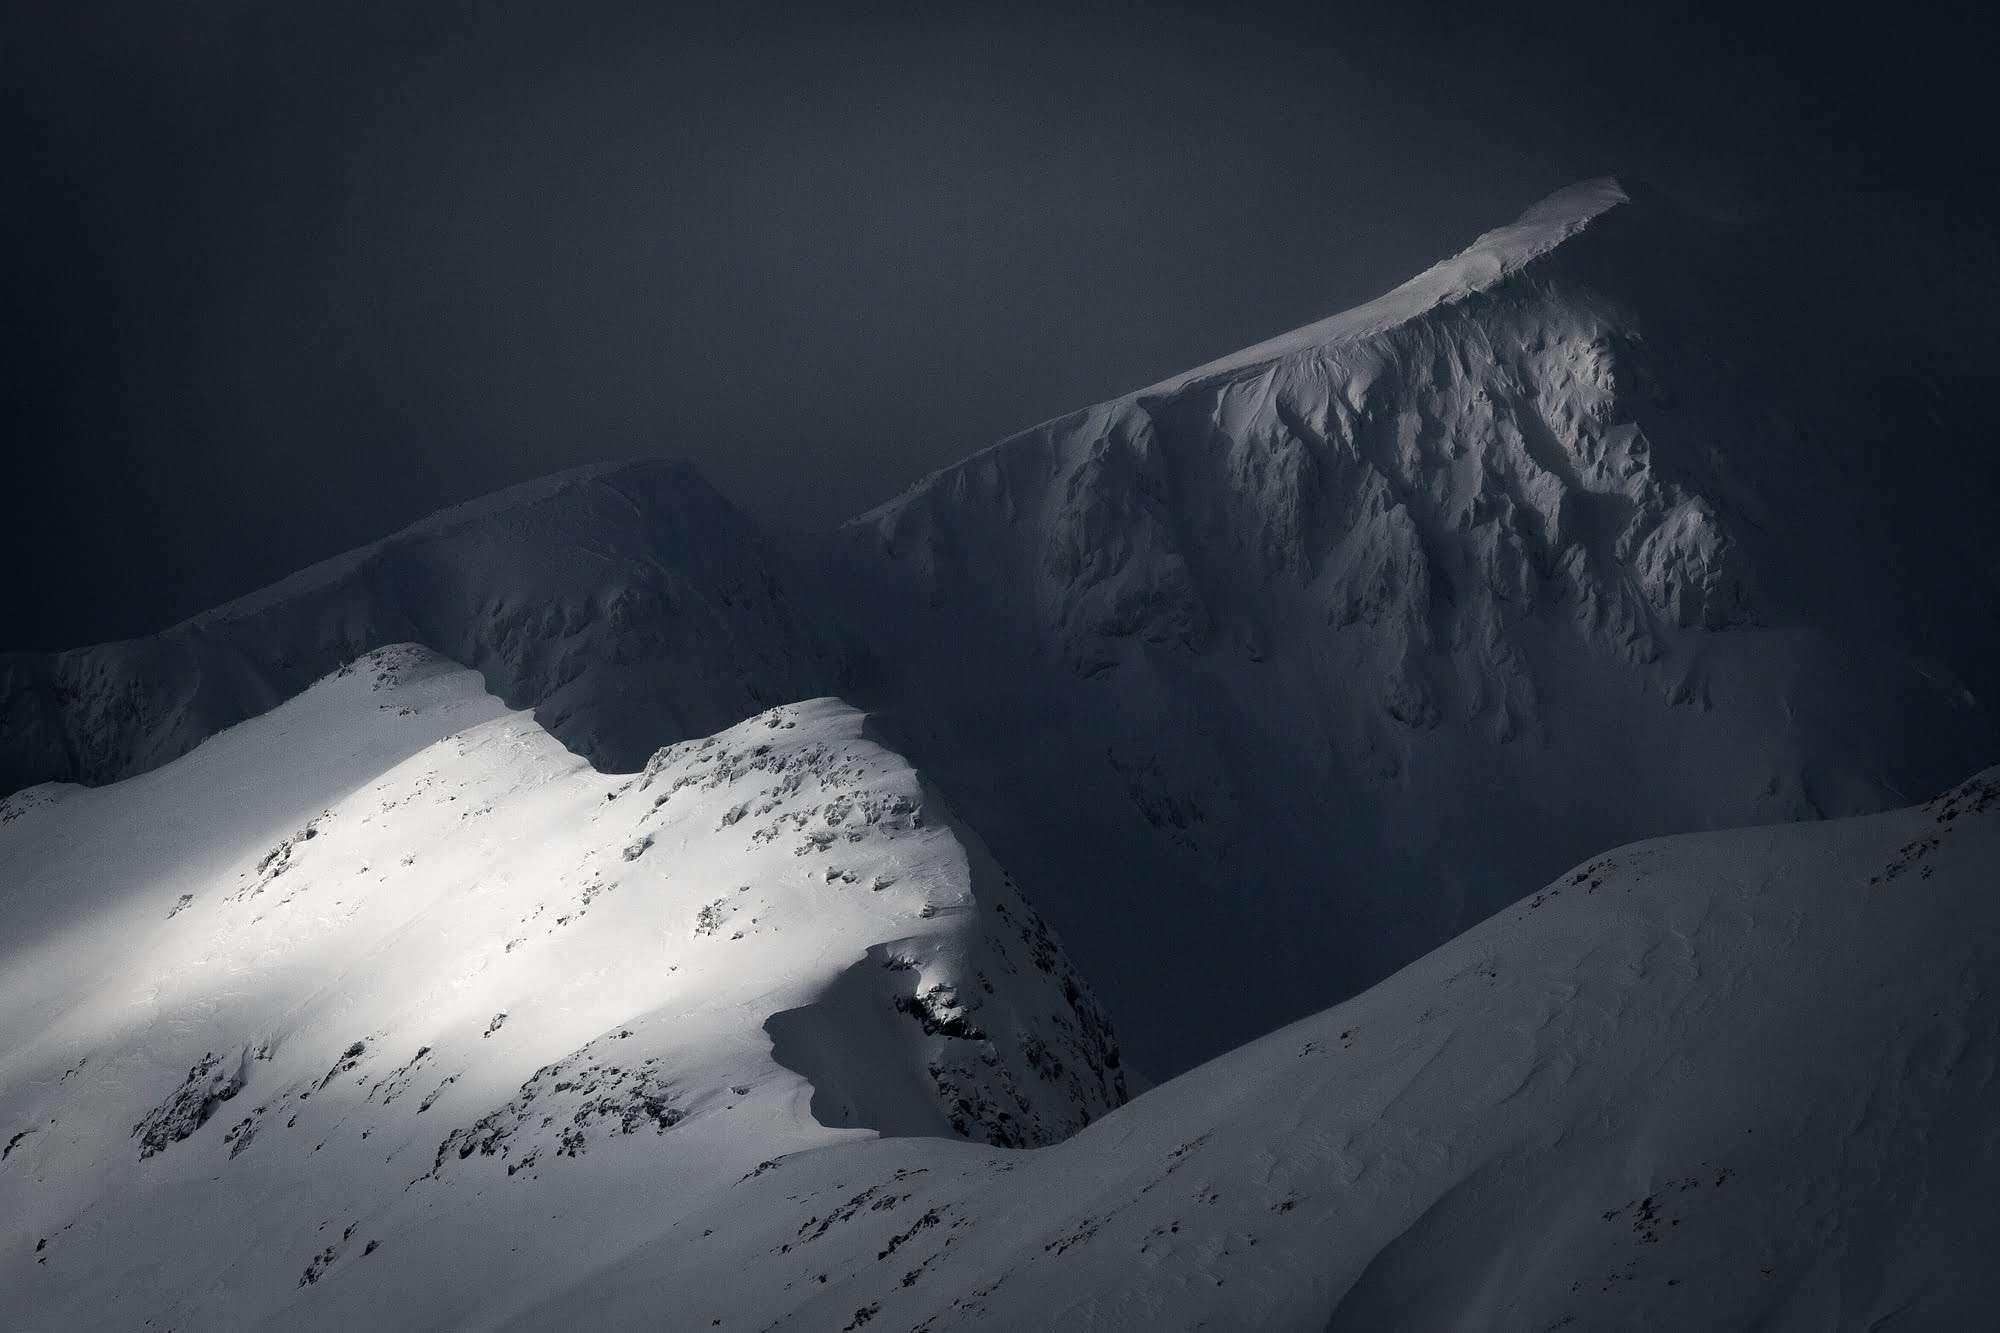 Jason Baxter - Landscape Photography competition